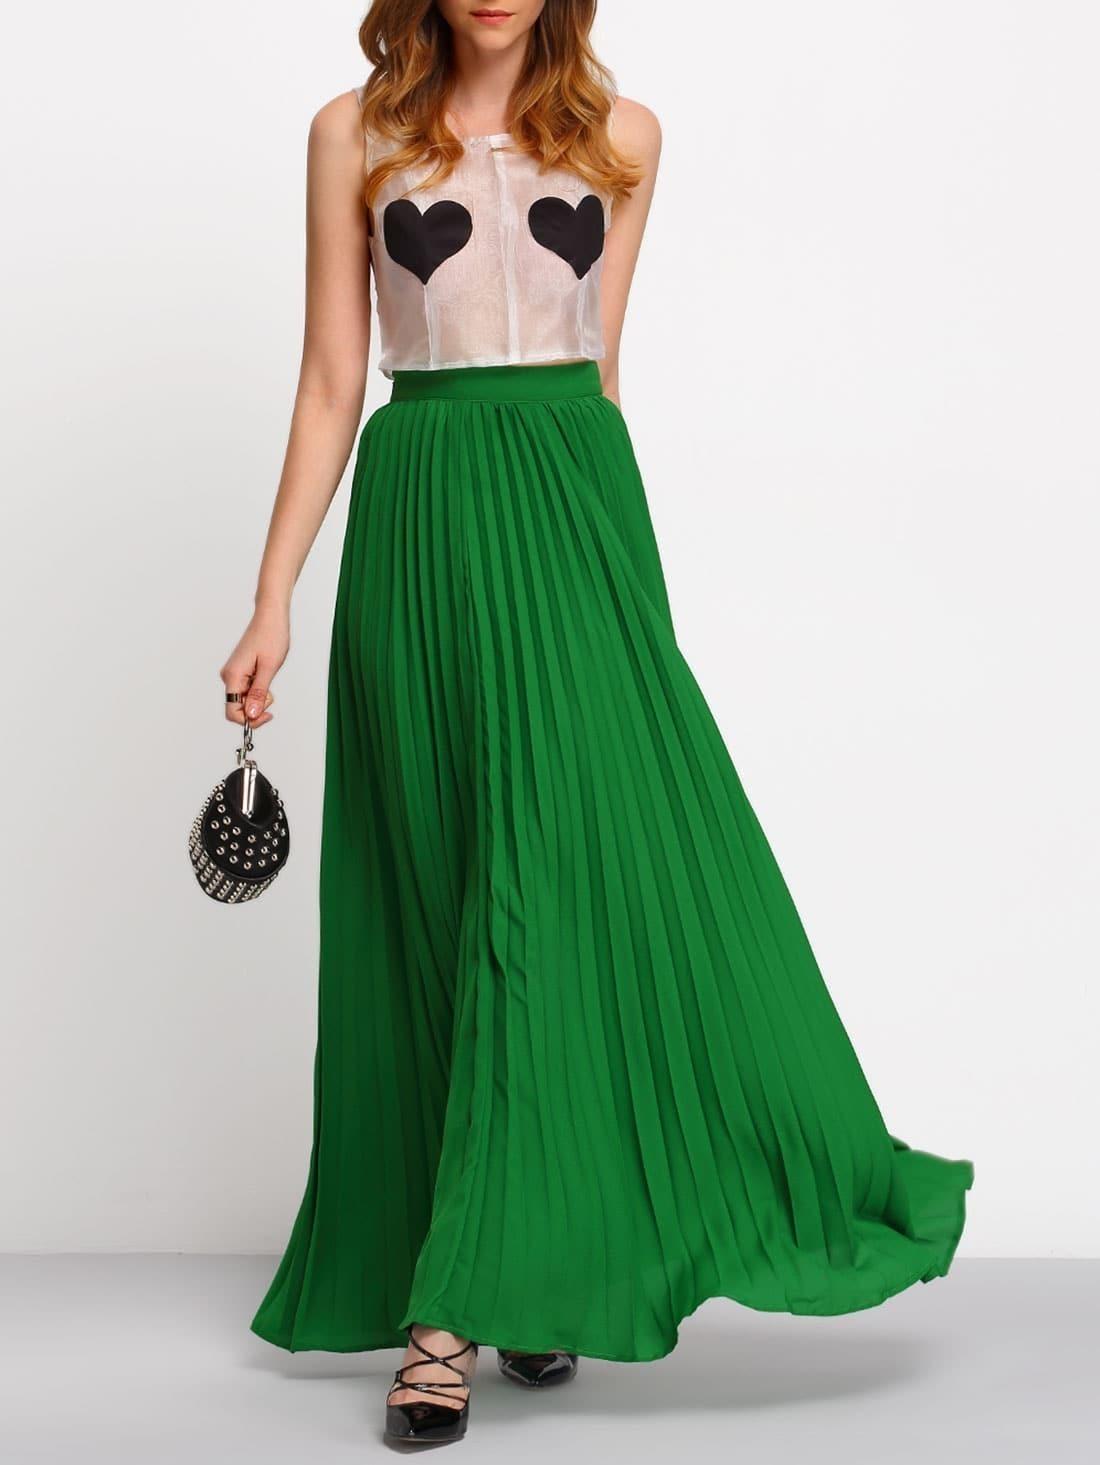 Green High Waist Pleated Maxi Skirt